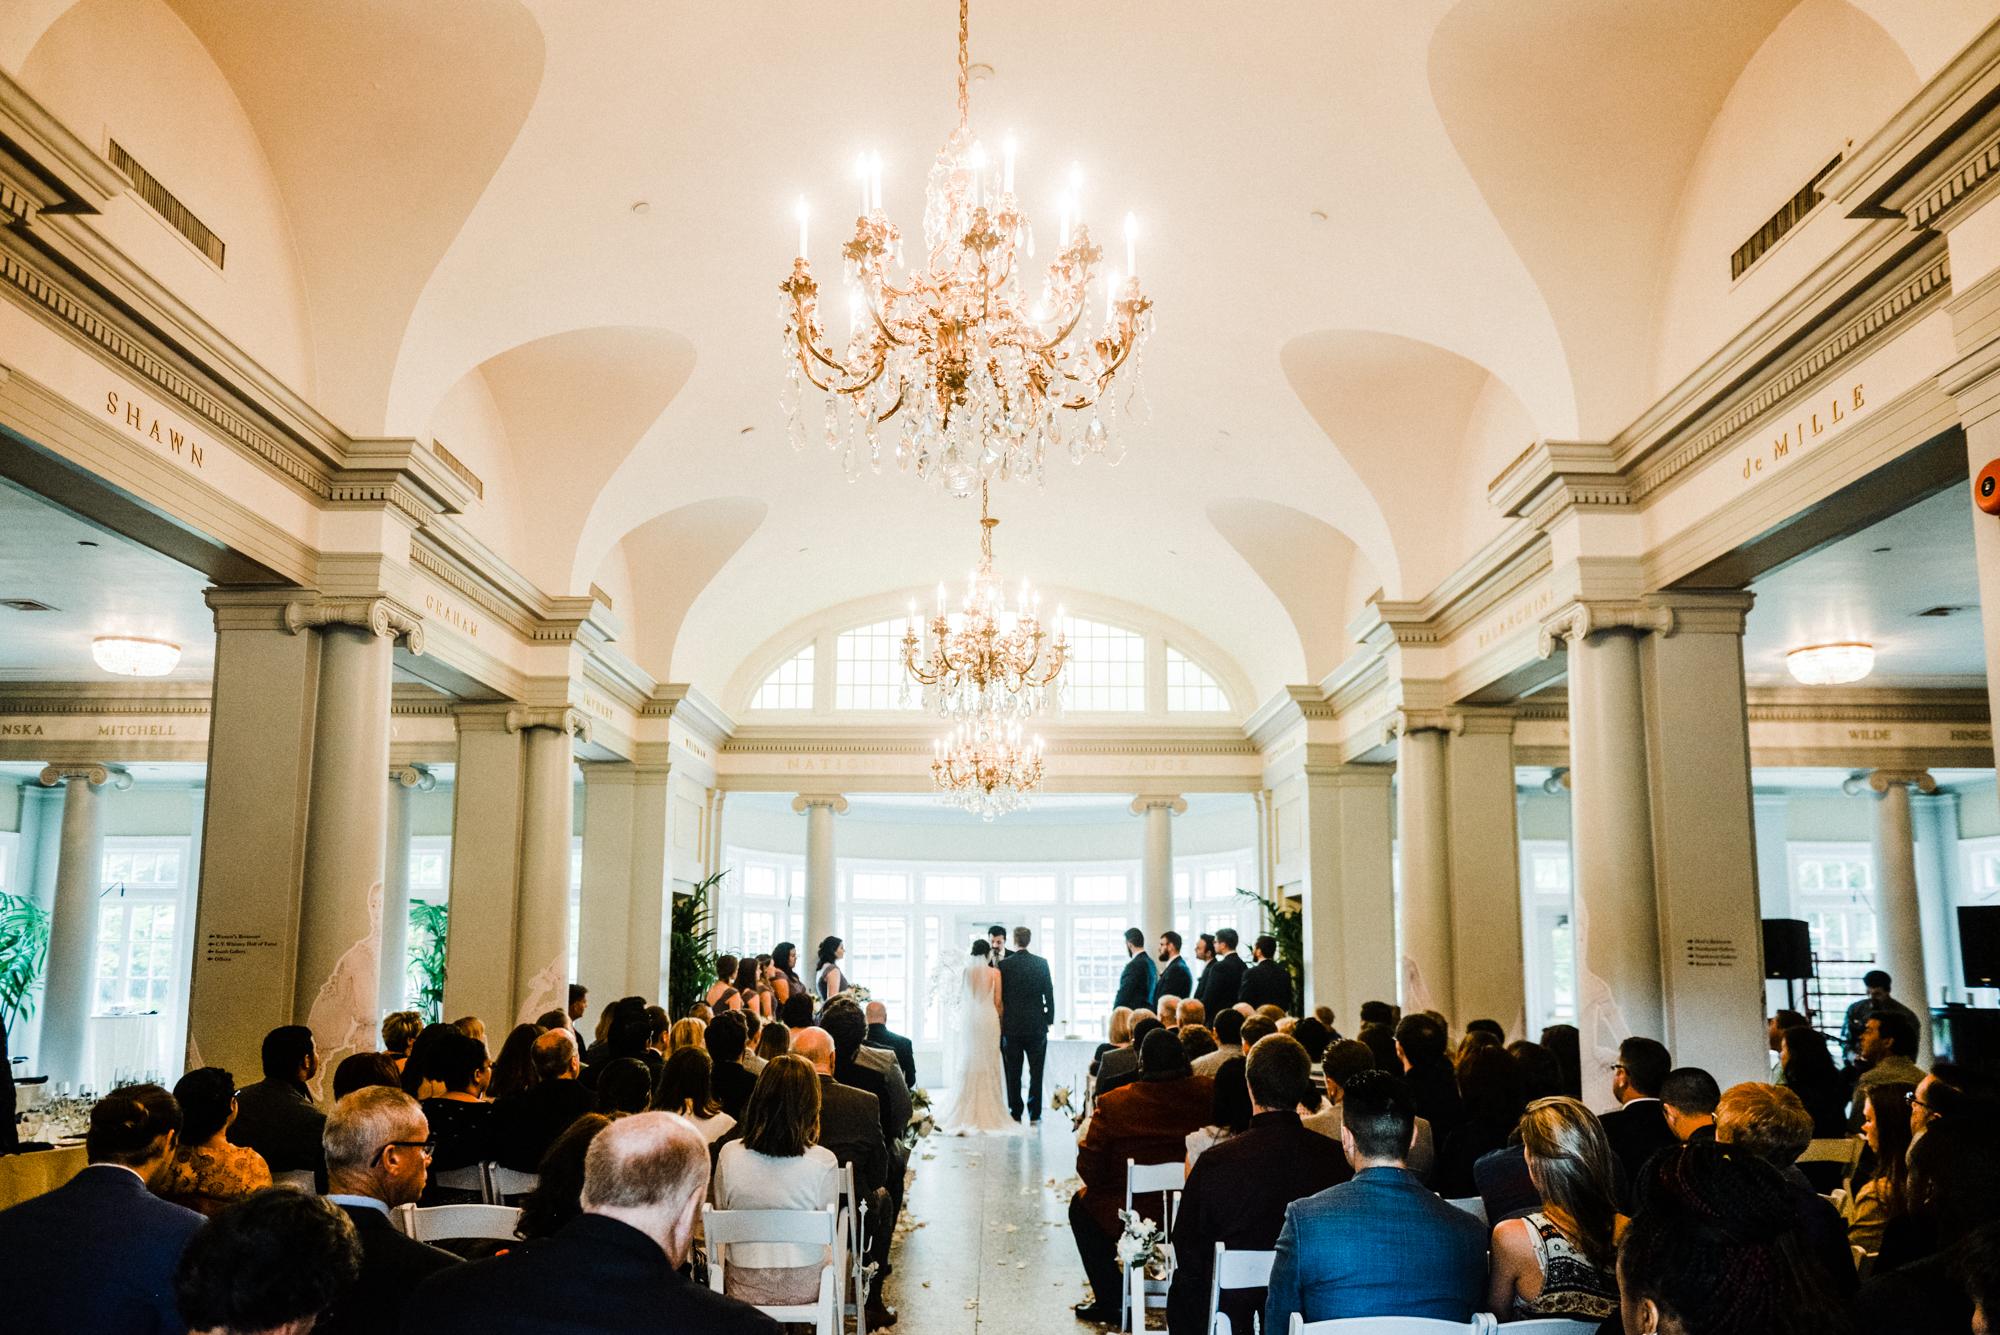 saratoga-springs-new-york-national-museum-of-dance-film-wedding-photographer-41.jpg